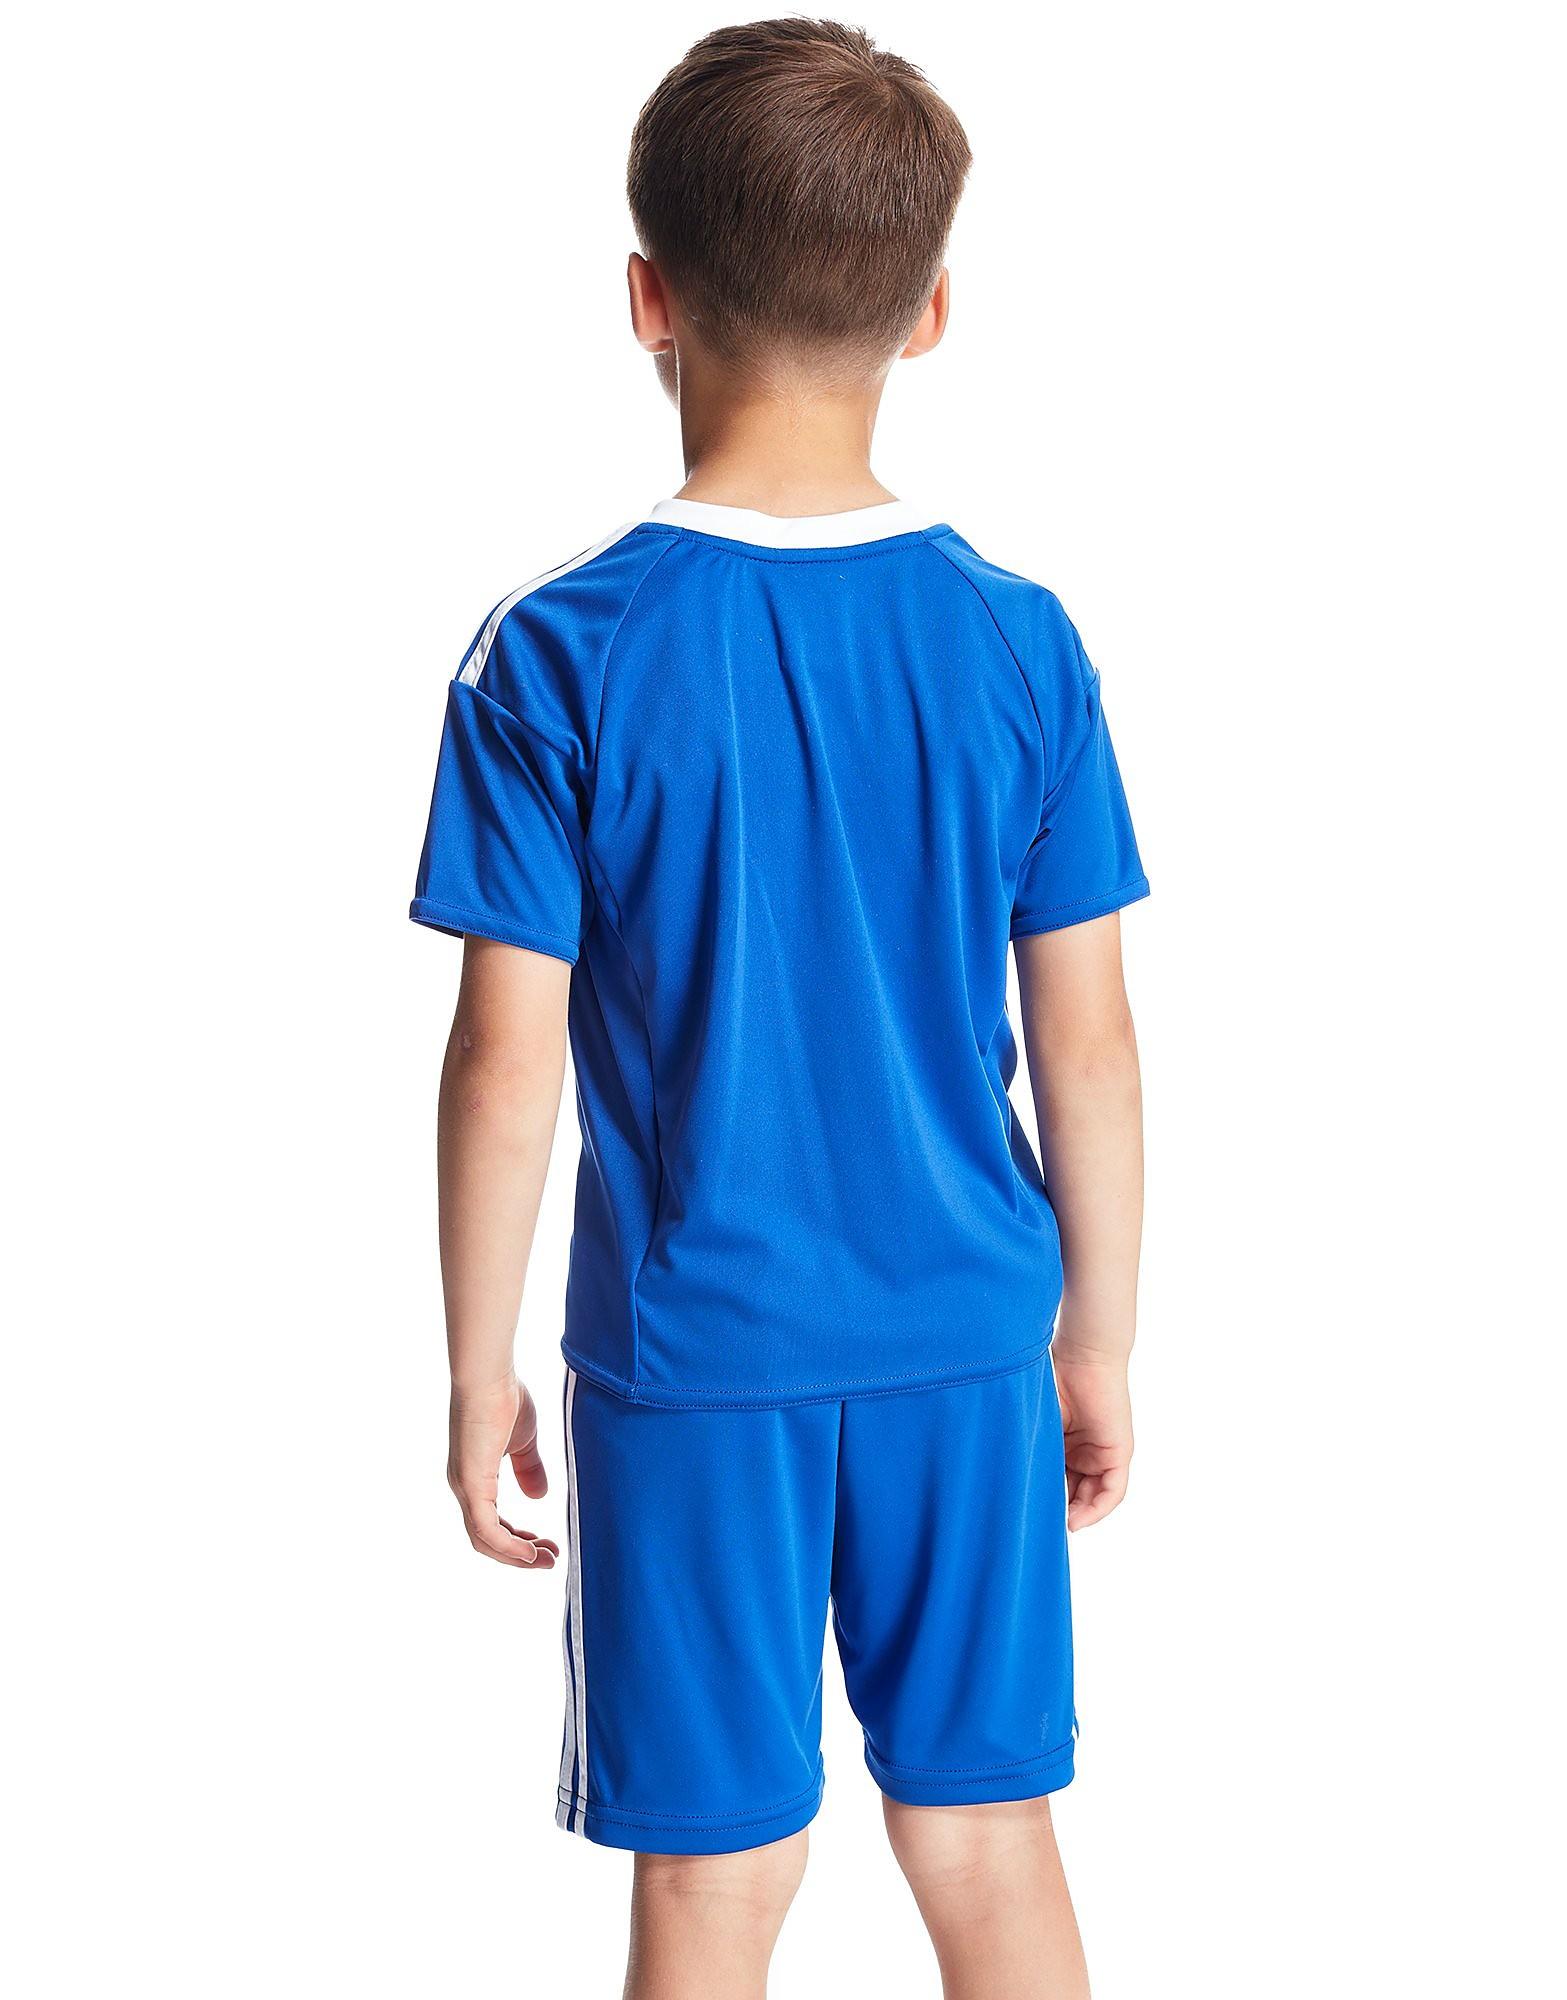 adidas Cardiff City FC 2016/17 Home Kit Children